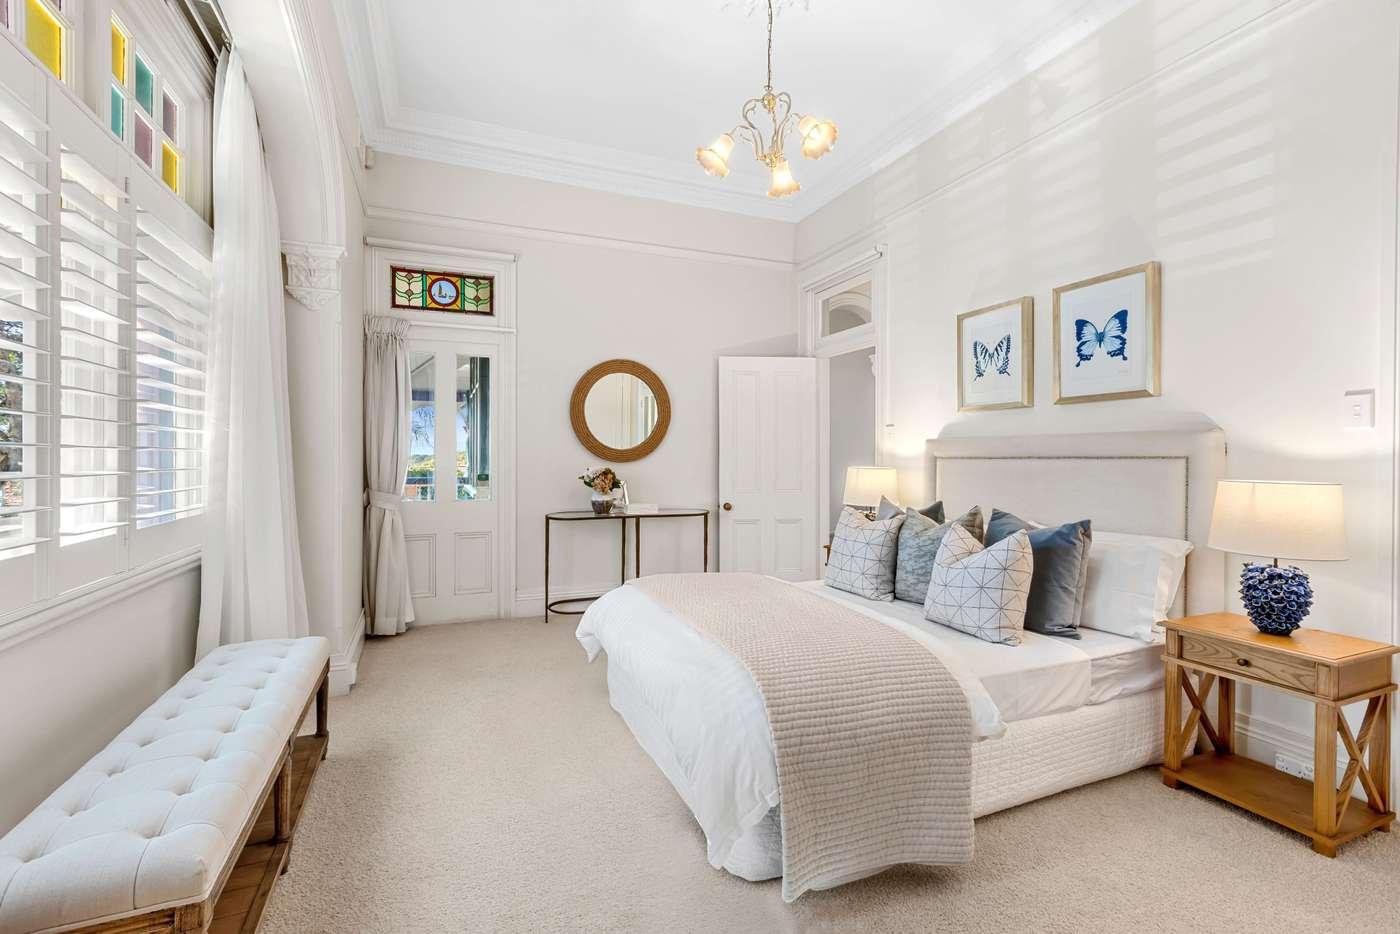 Fifth view of Homely apartment listing, 1/145 Raglan Street, Mosman NSW 2088